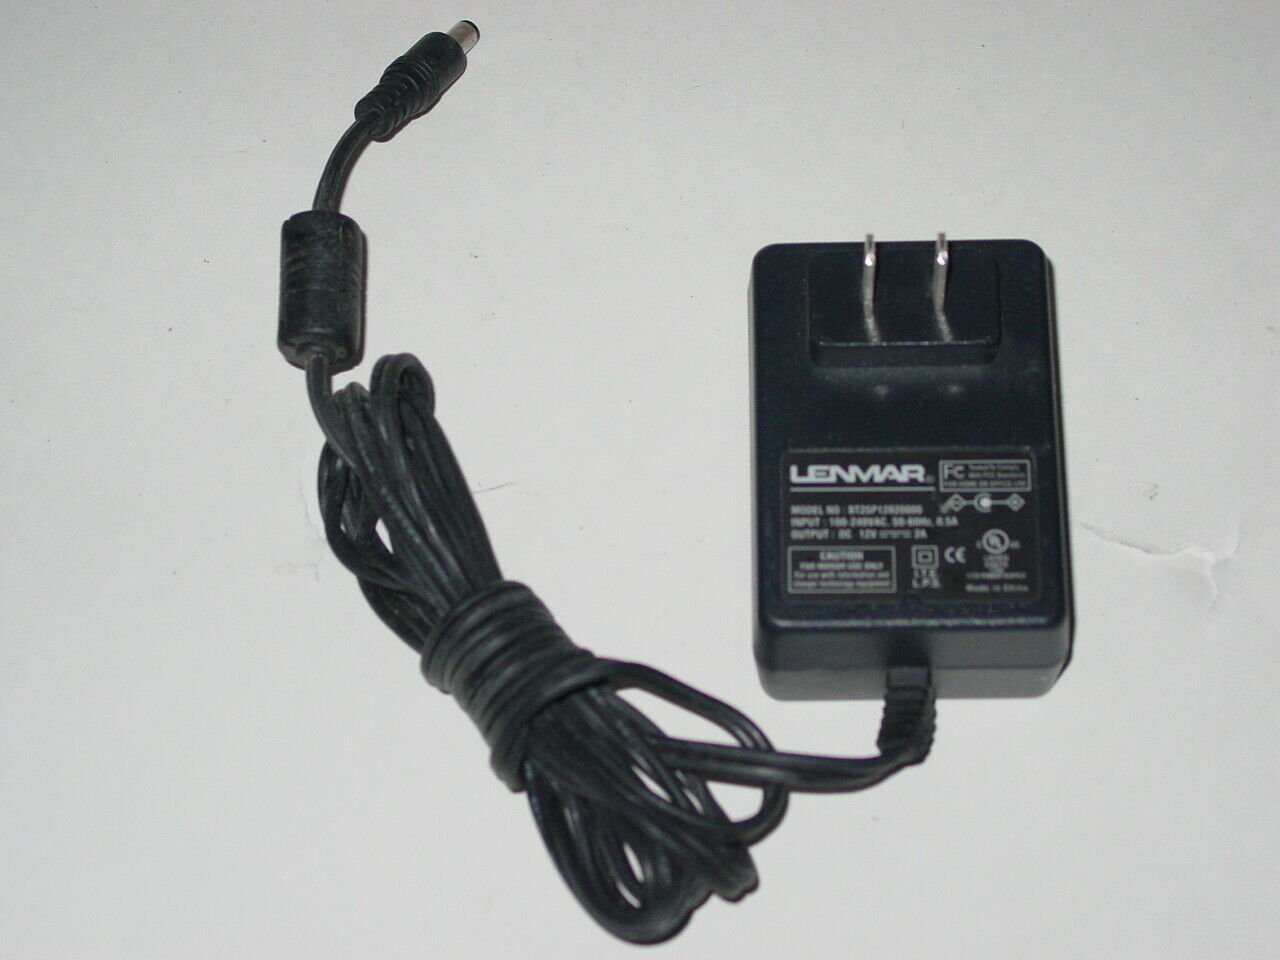 Lenmar BT25P12020000 AC Power Adapter 12V 2A